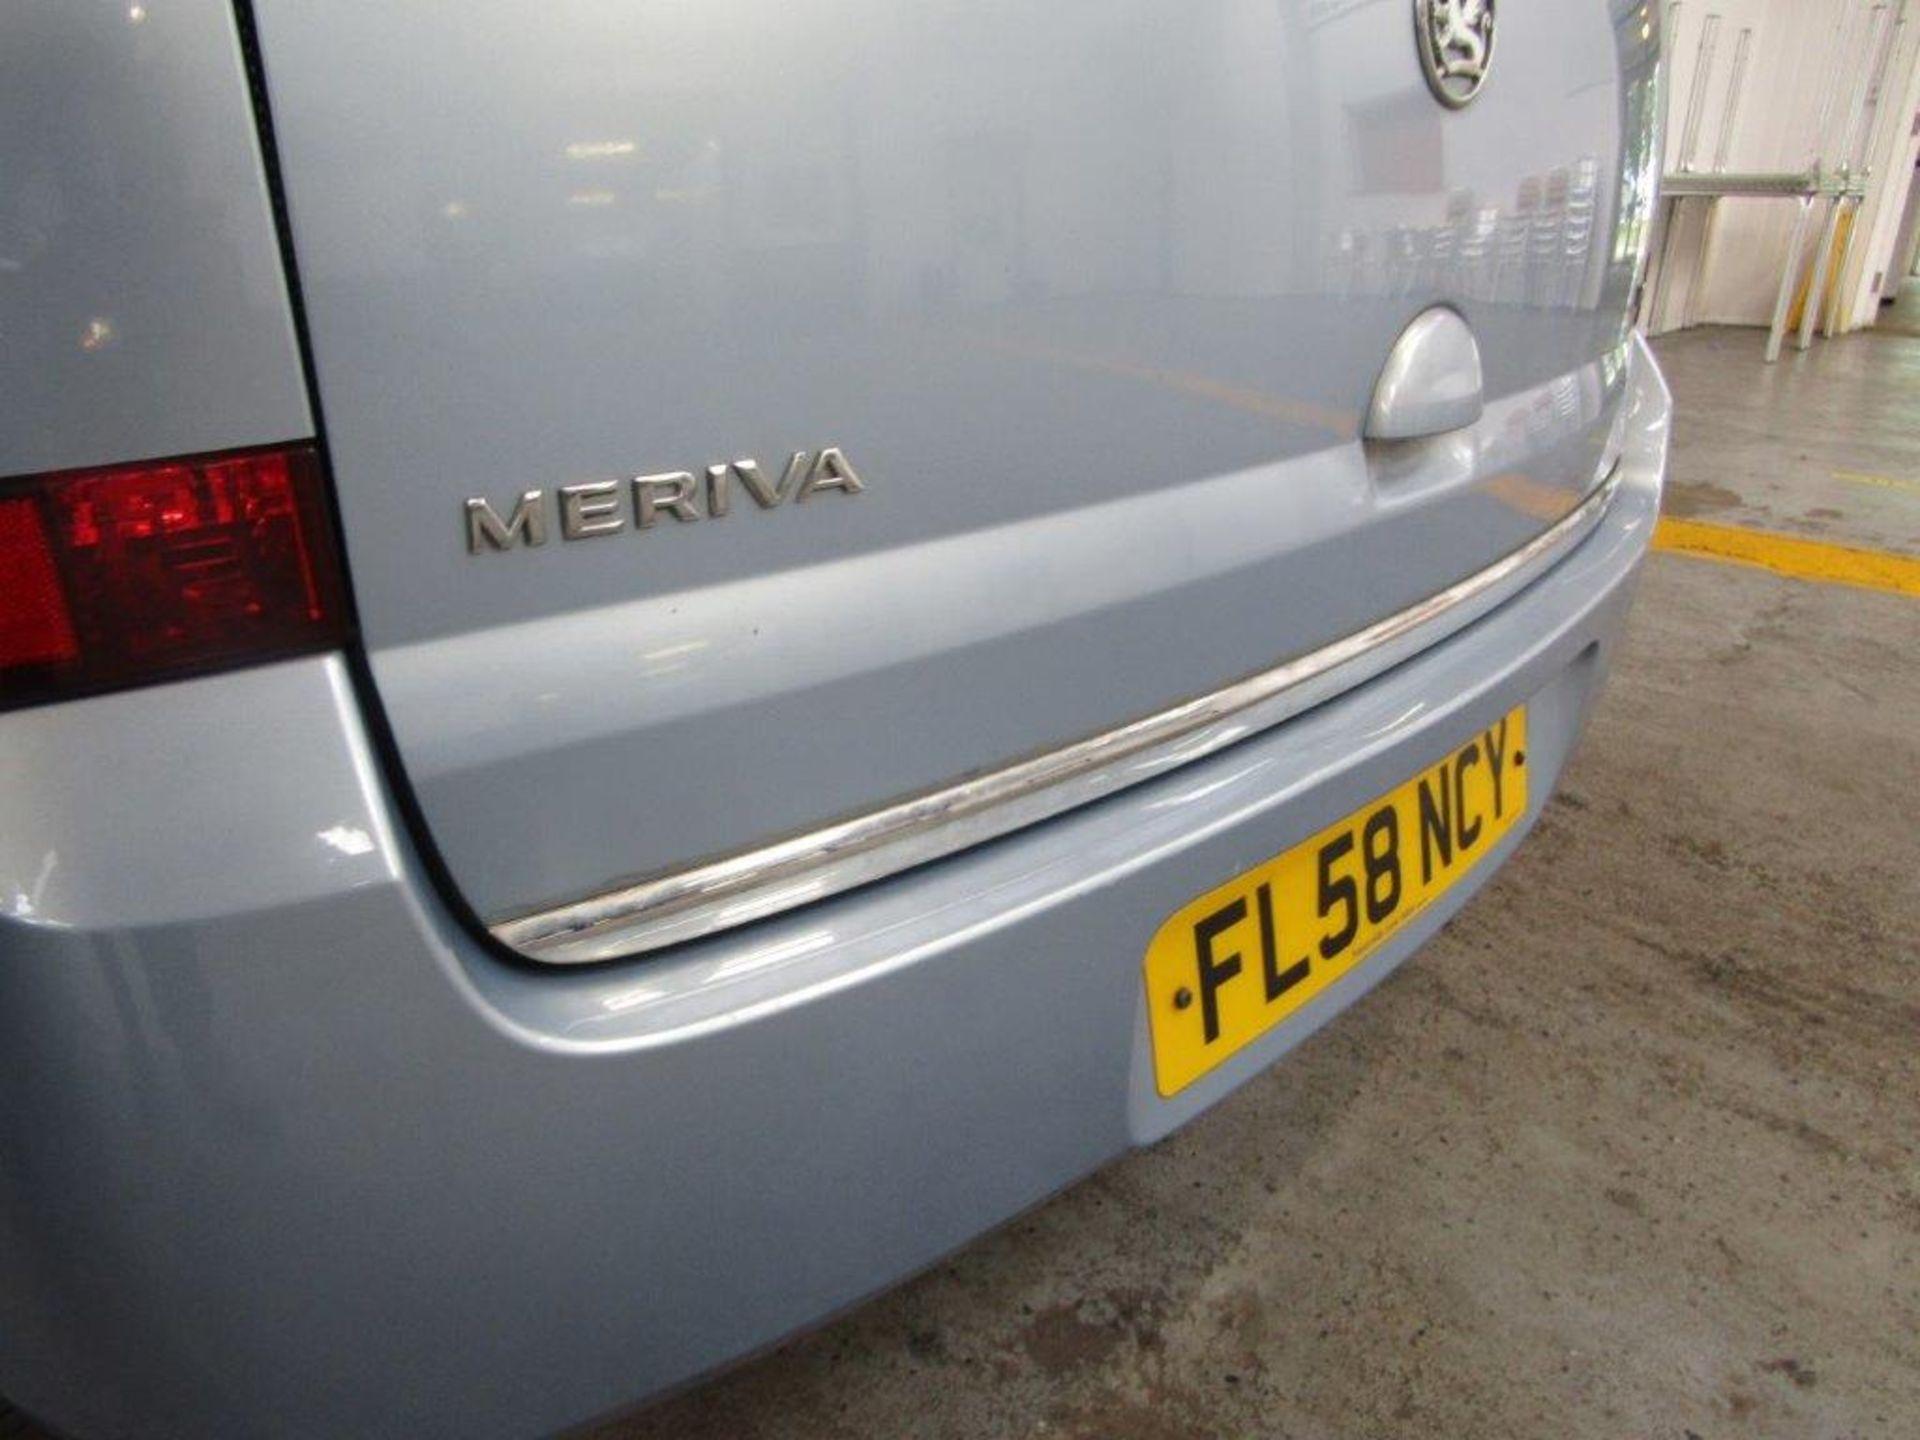 58 08 Vauxhall Meriva Design - Image 13 of 25